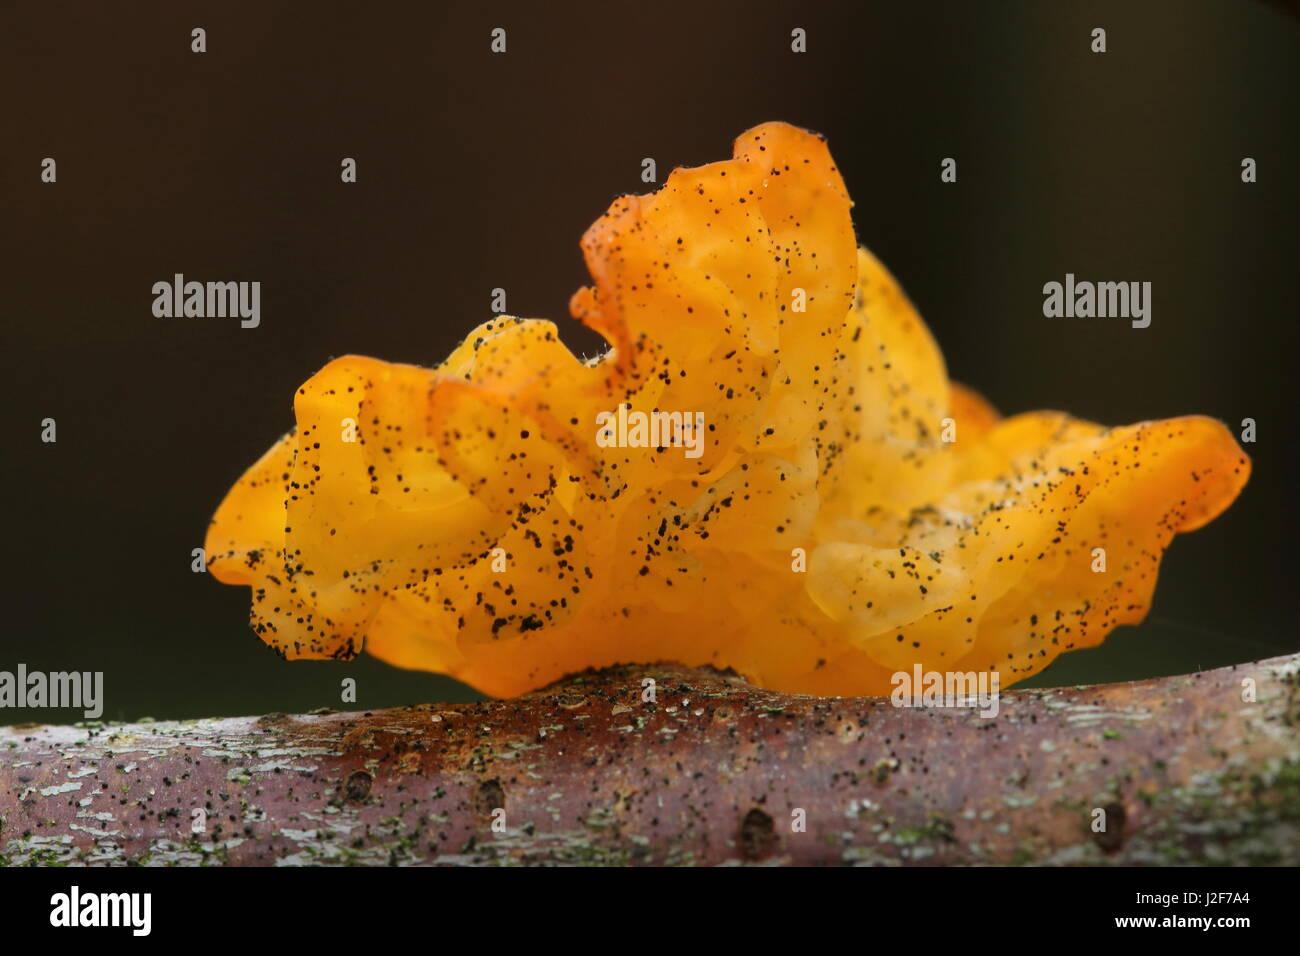 Golden jelly (tremella mesenterica) - Stock Image